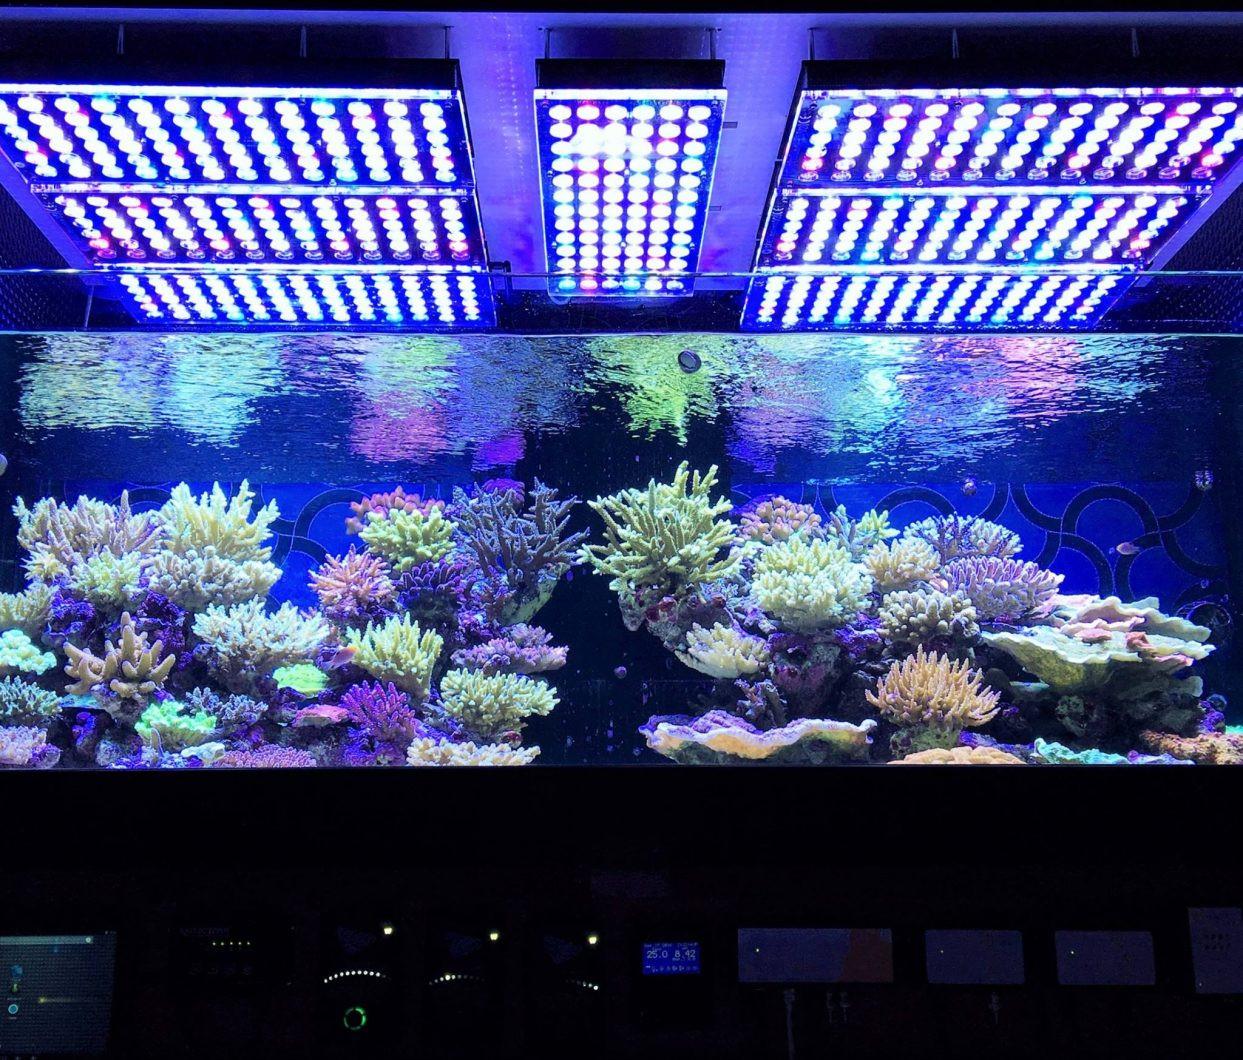 Best ideas about Led Aquarium Lights . Save or Pin Aquarium LED Lighting • Orphek Now.